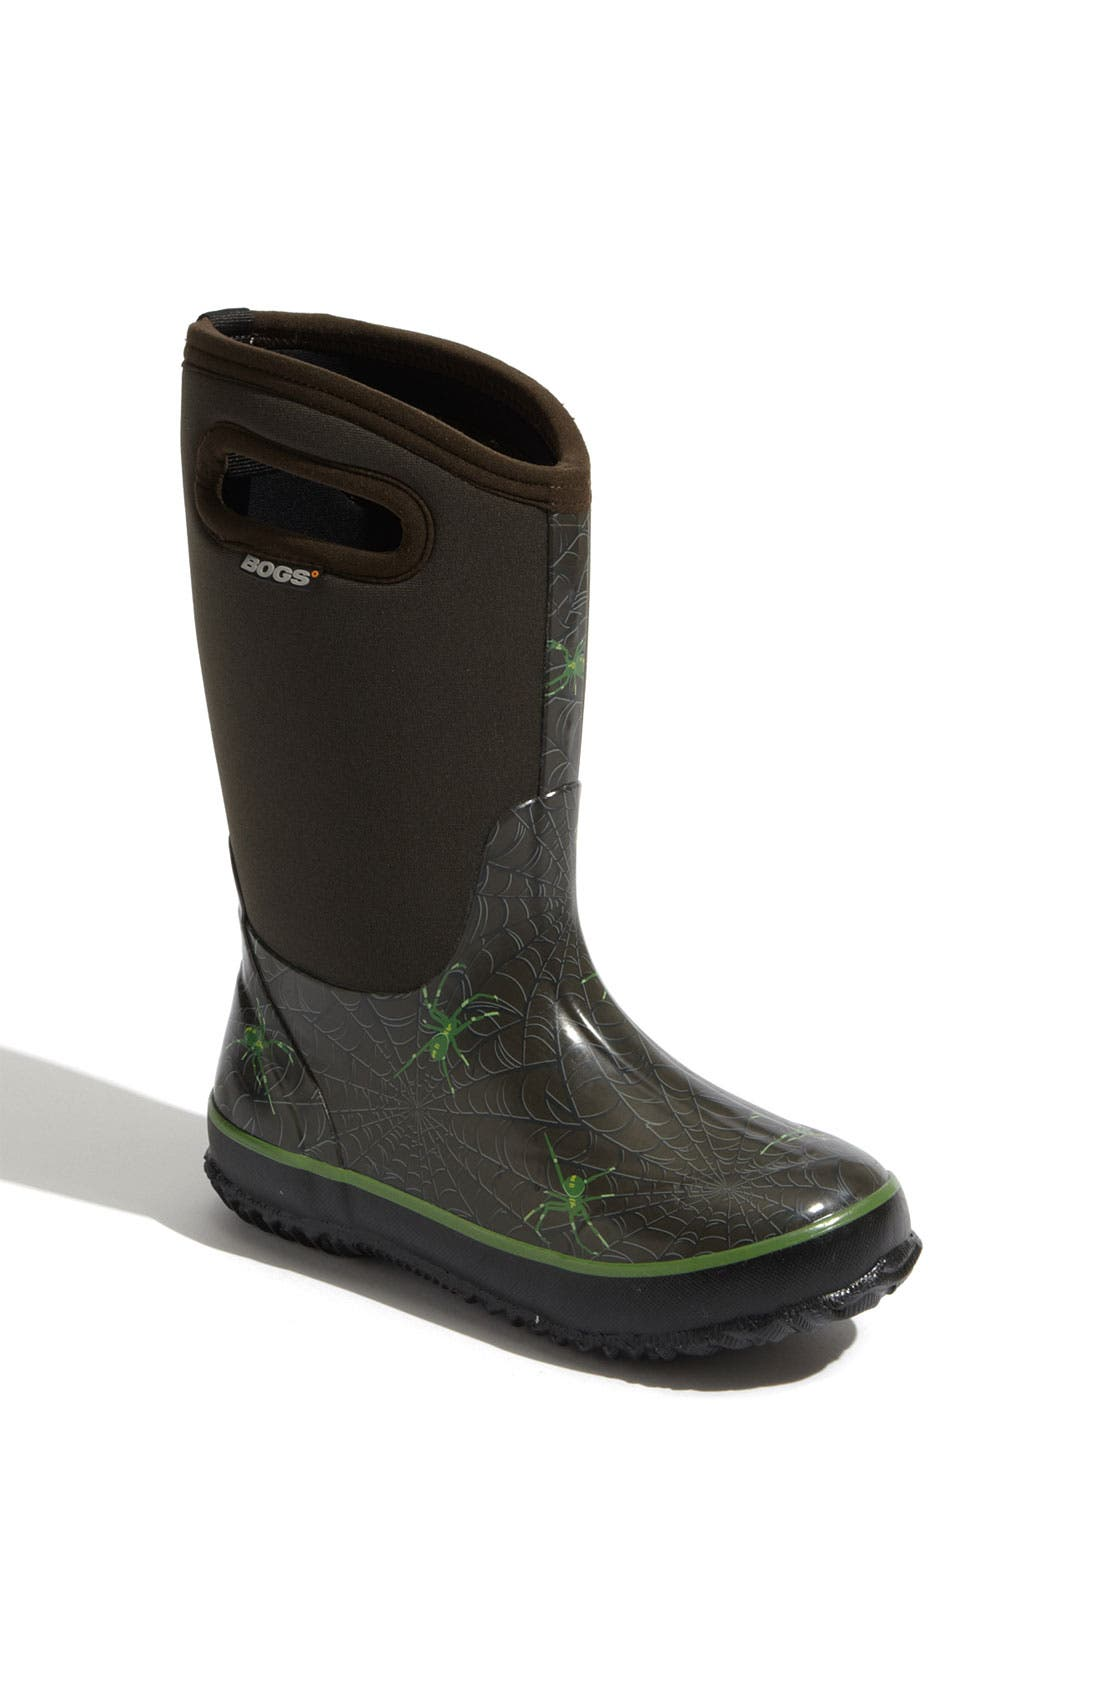 Main Image - Bogs 'Classic High' Waterproof Boot (Toddler, Little Kid & Big Kid)